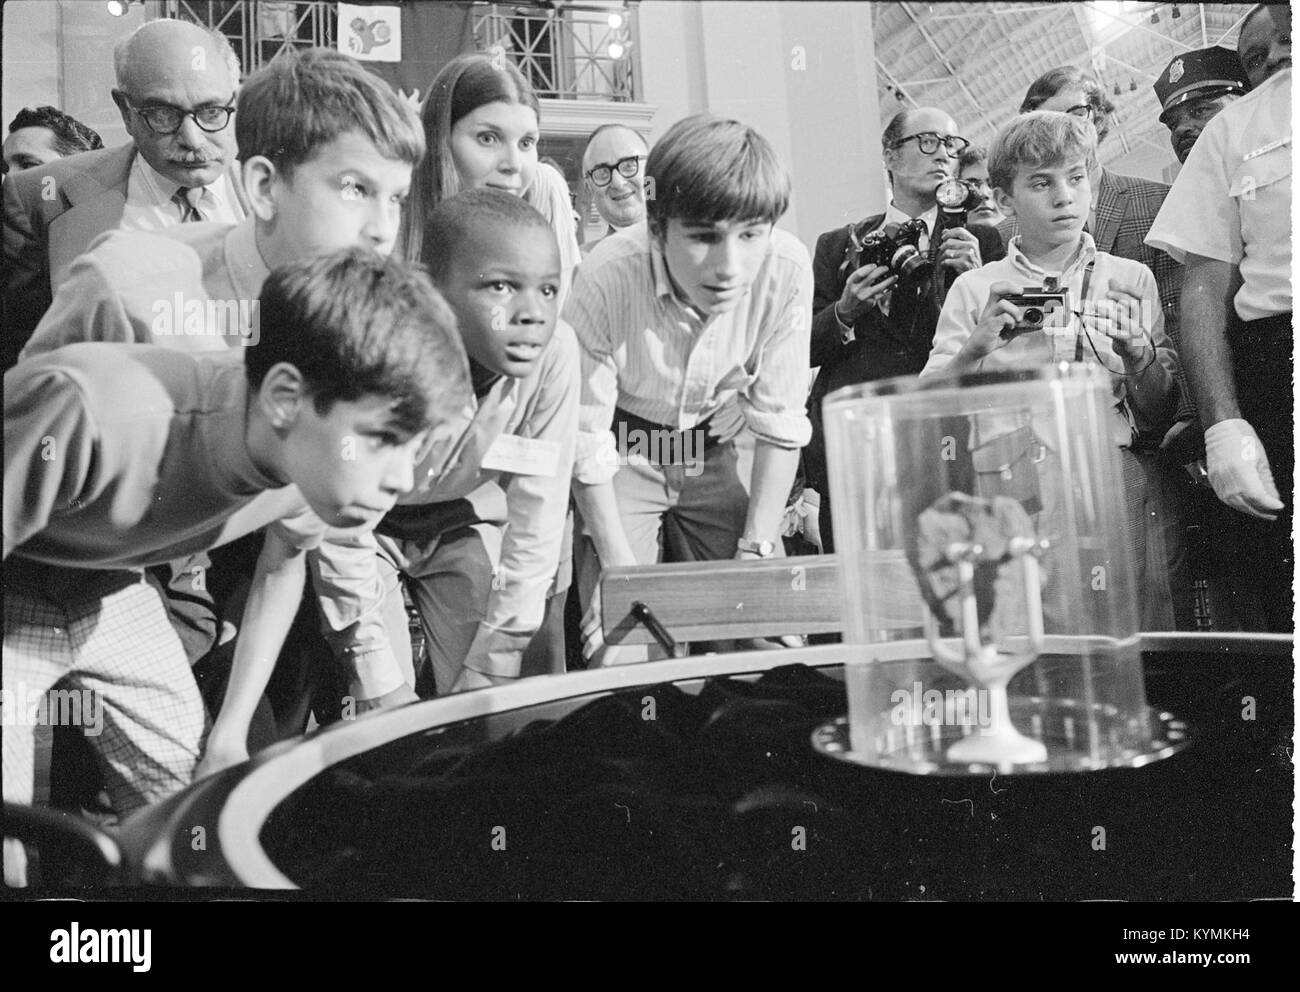 Lunar Sample Exhibit, Arts & Industries Building, 1970 8723821902 o - Stock Image